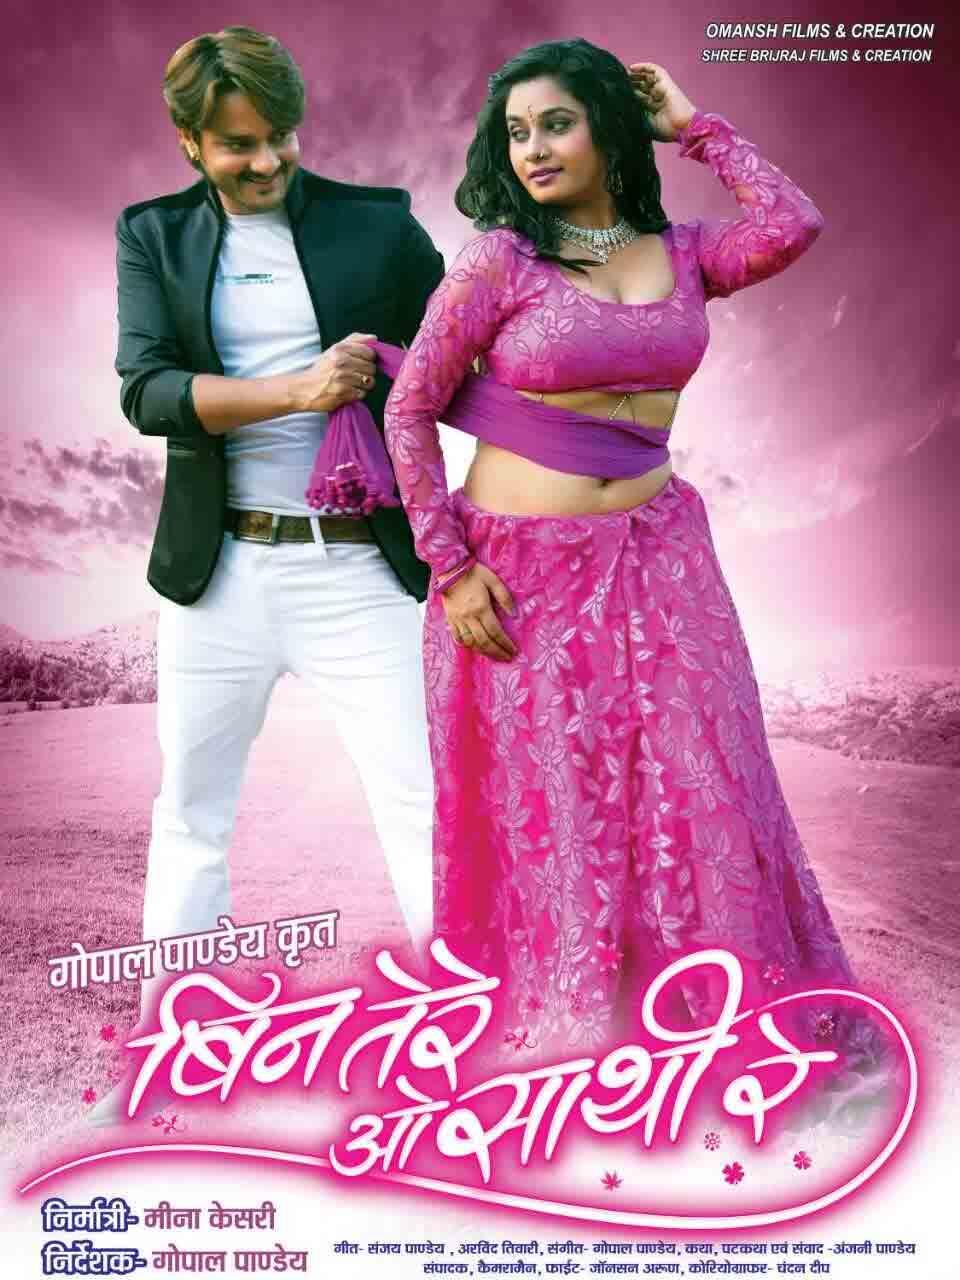 Bhojpuri film Bin Tere